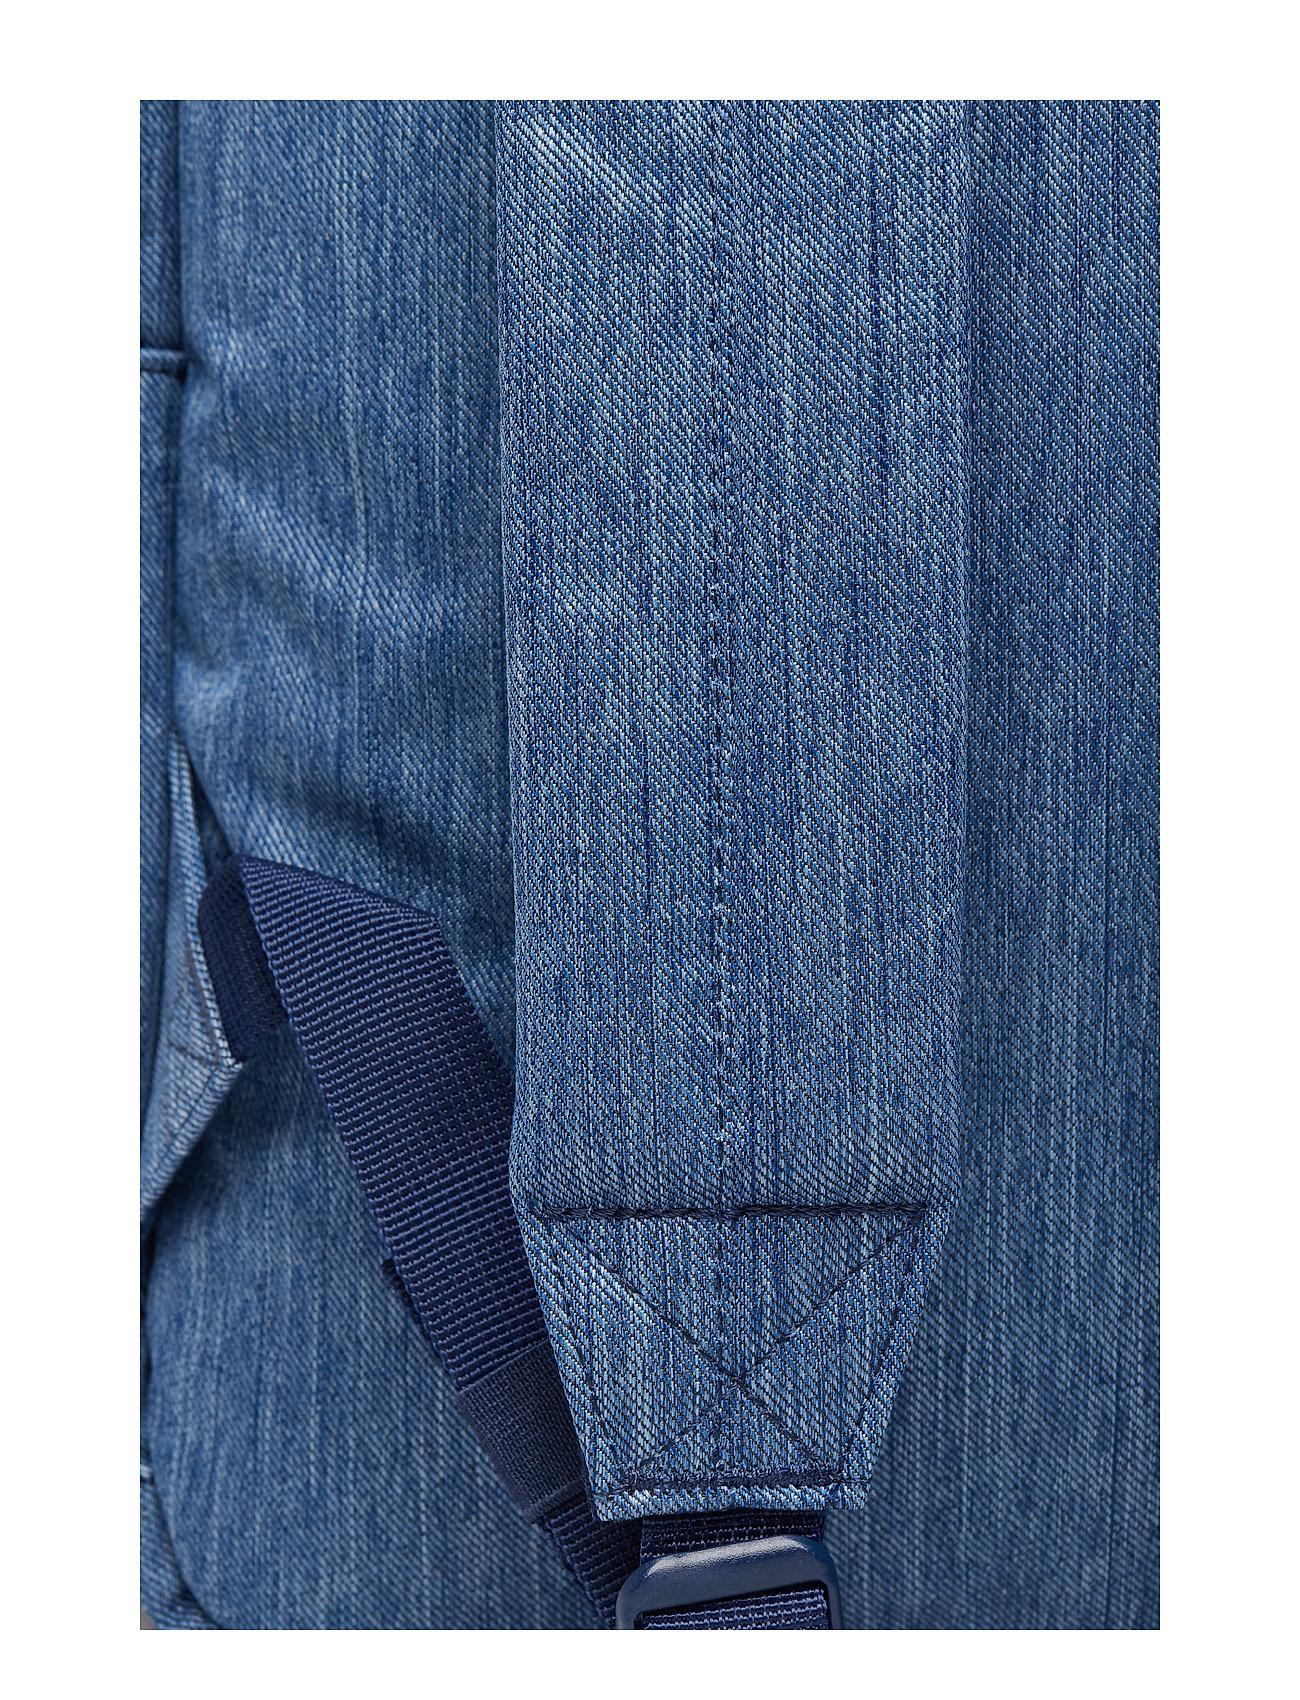 Classic indigo Denim largefaded DenimHerschel X TPZiOukX